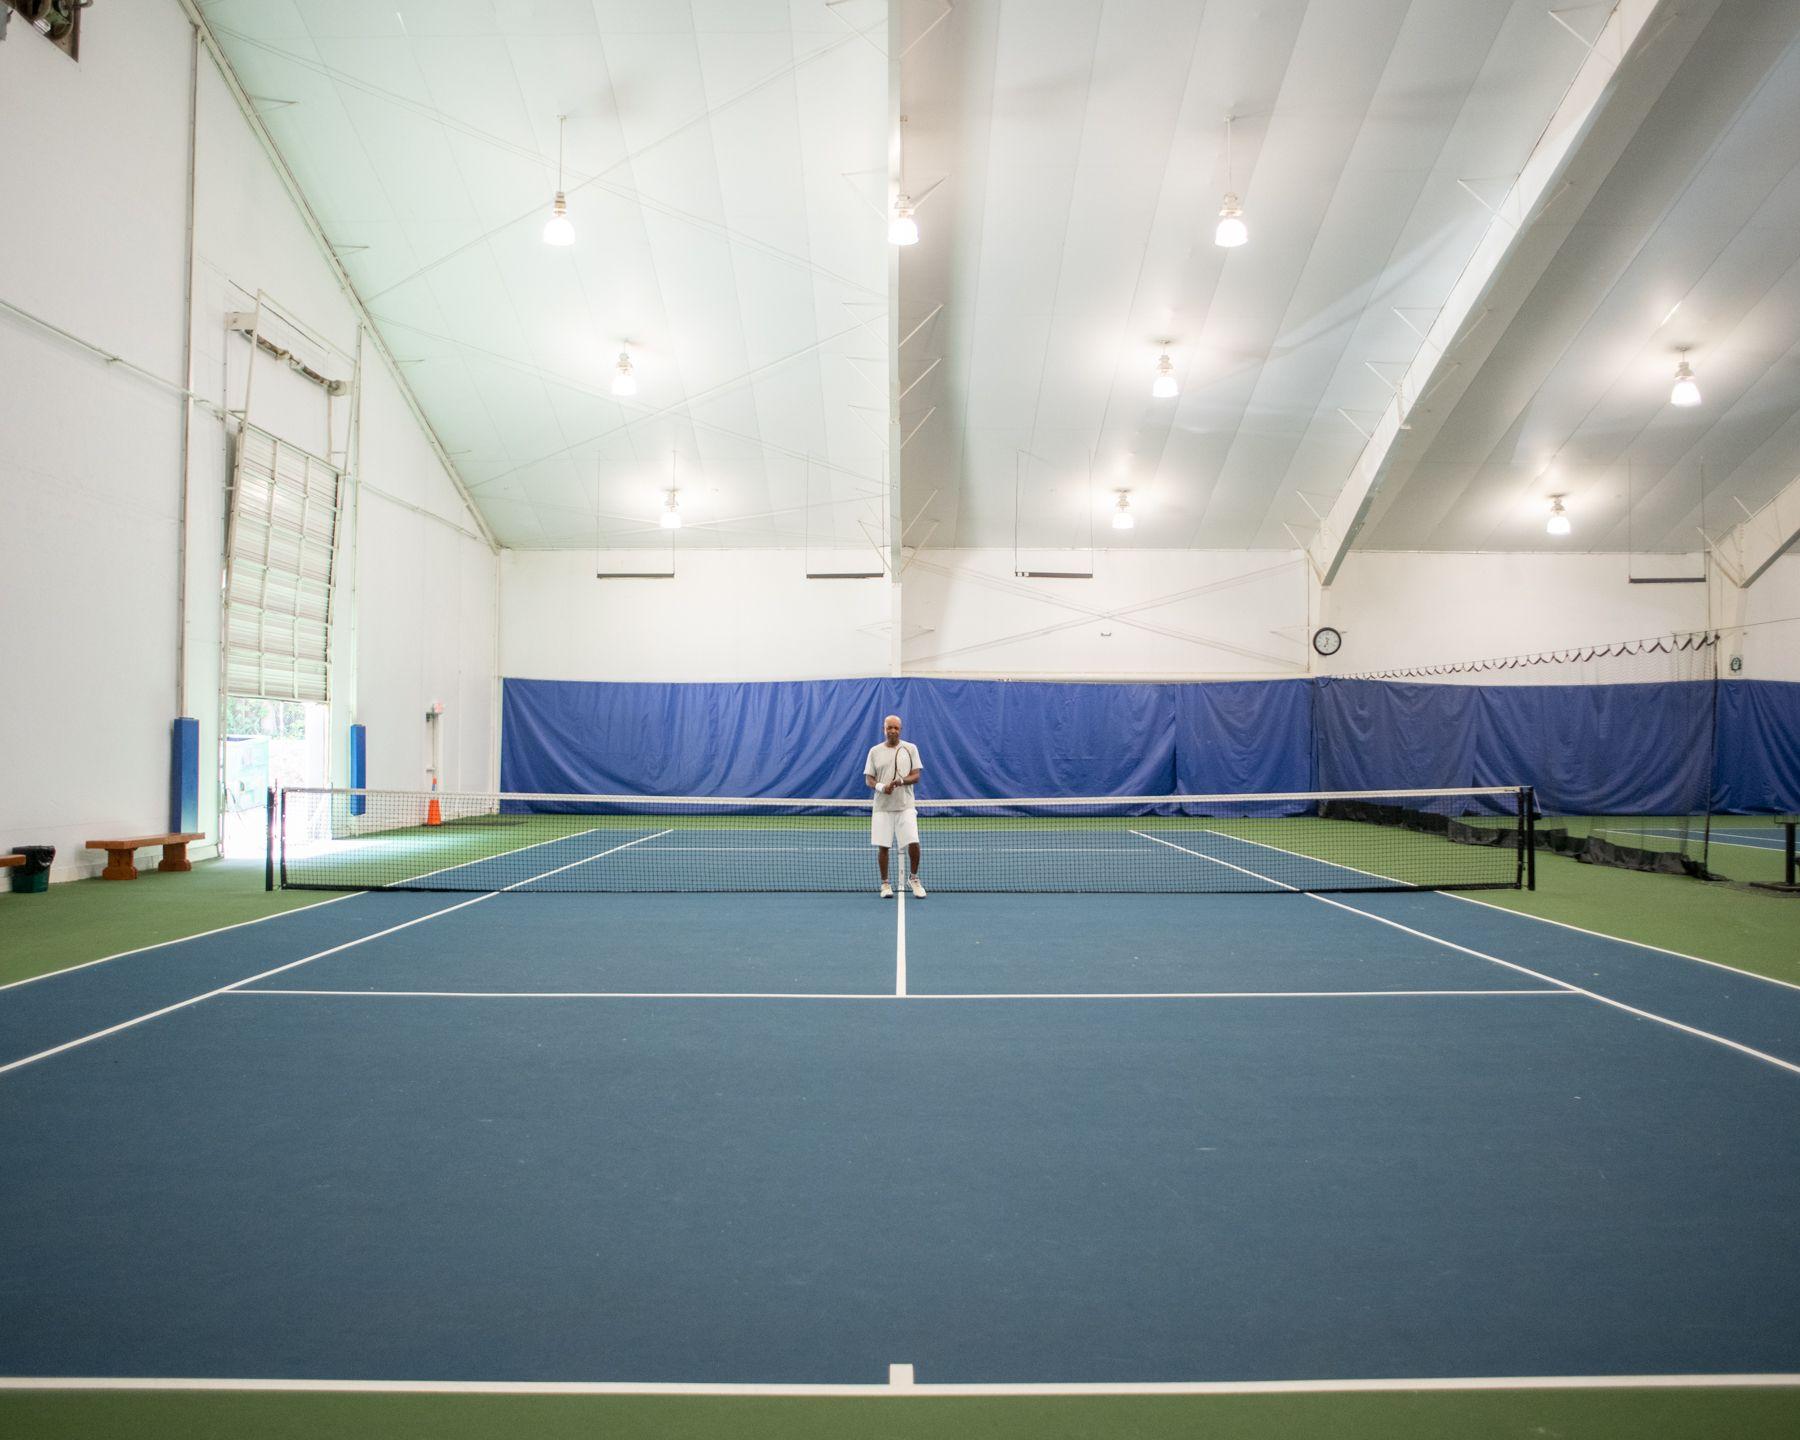 Junius Chatman, tennis director at Oak Hollow Tennis Center in High Point, NC, stands far away on indoor court.